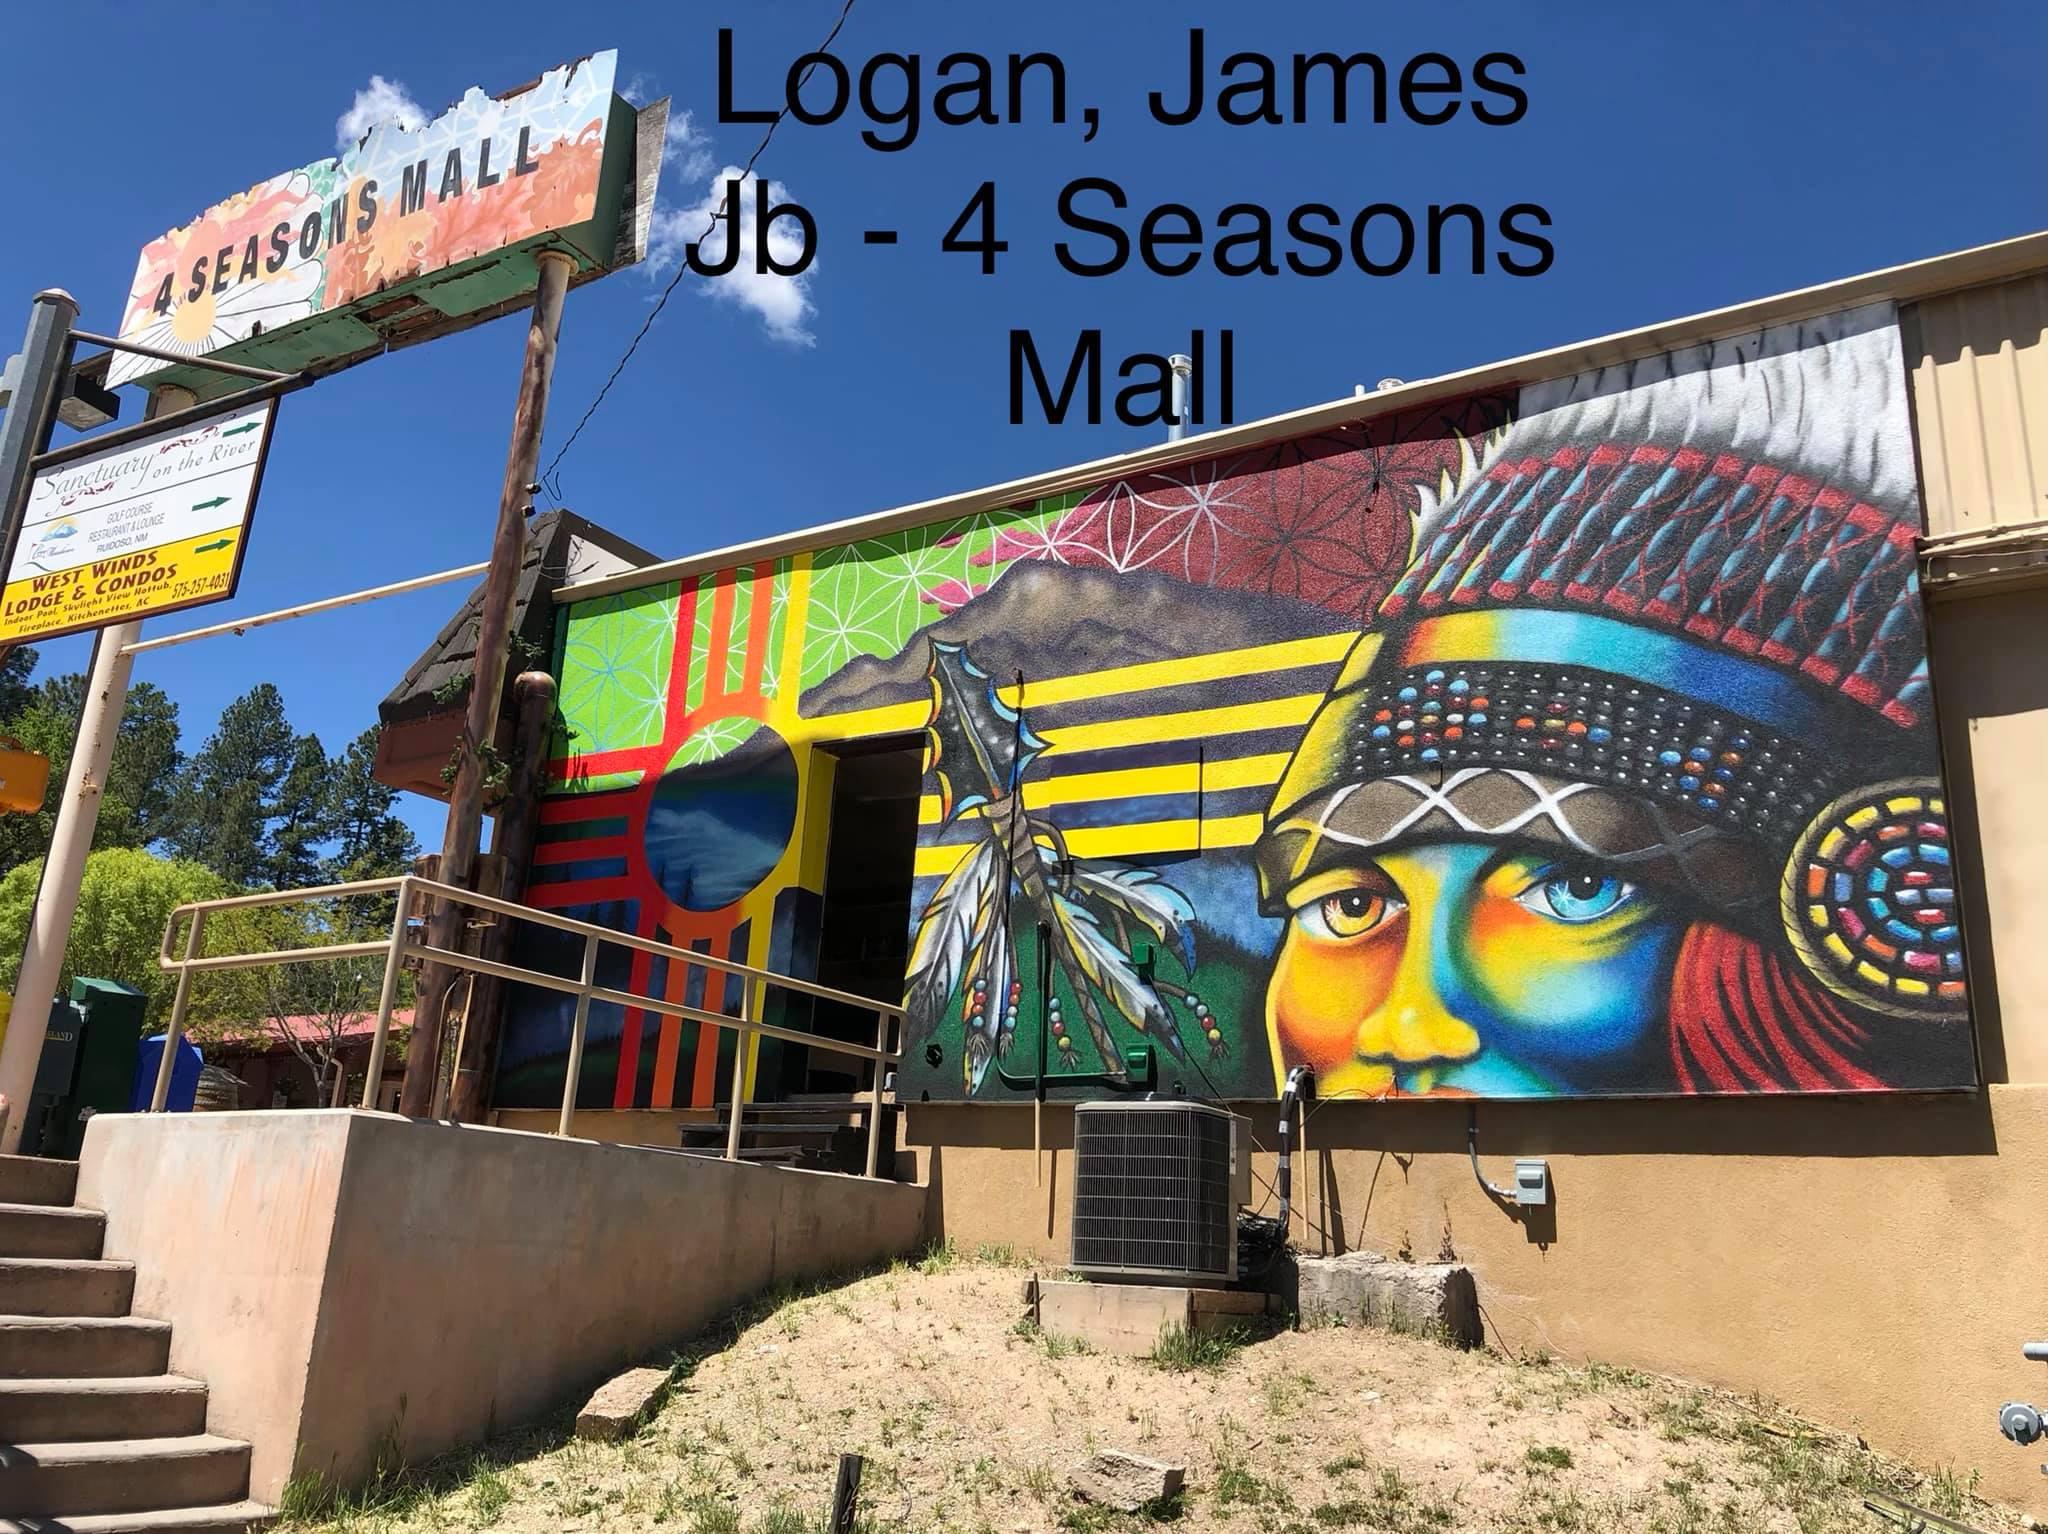 Photo: Mural at Four Seasons Mall